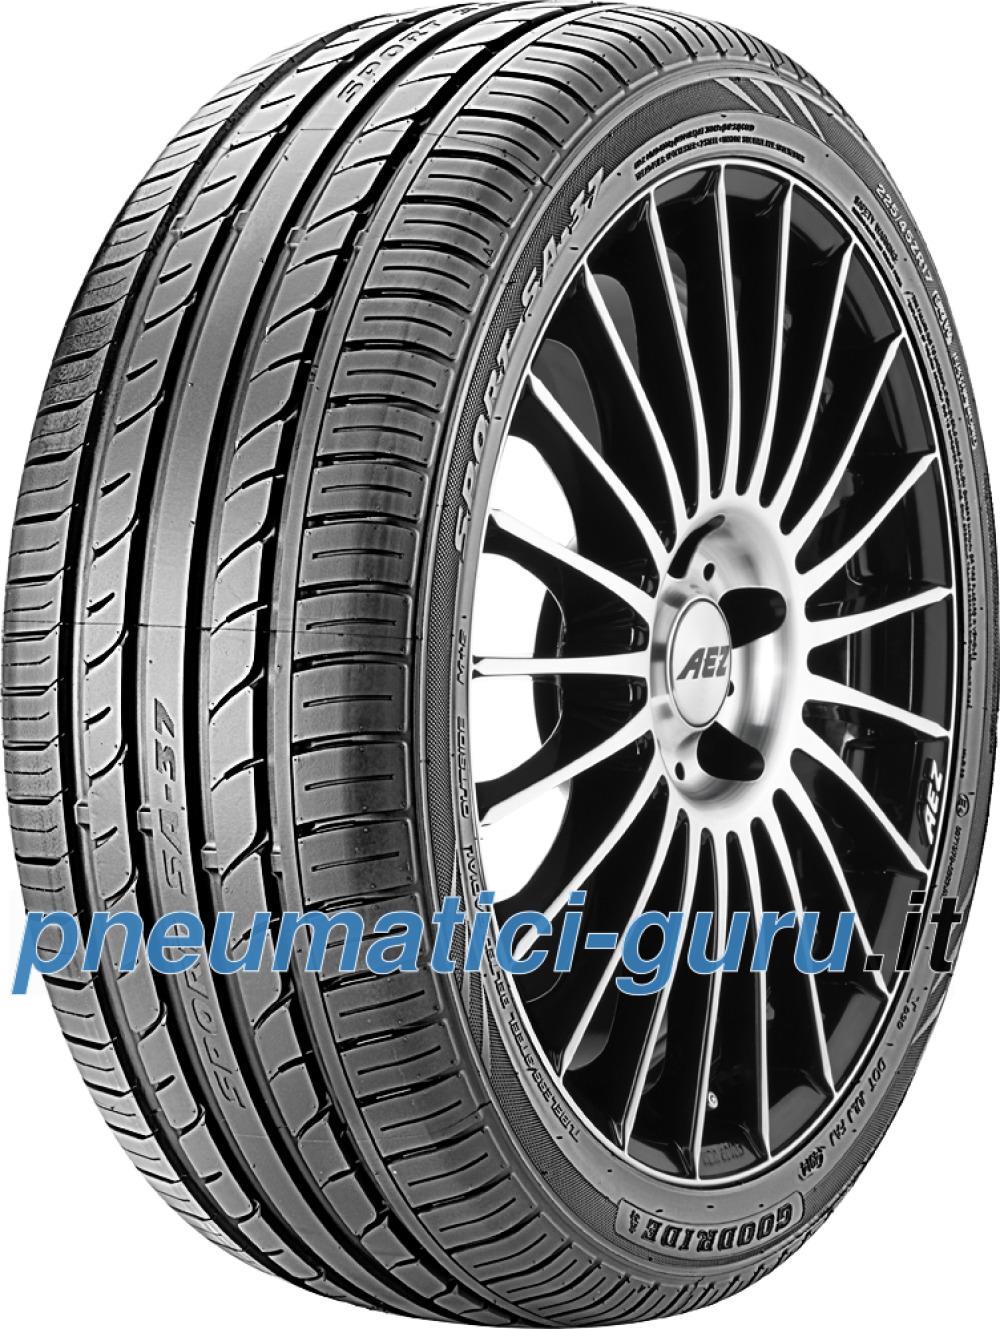 Pneumatici Goodride SA37 Sport 245//40 R18 97Y Estivi